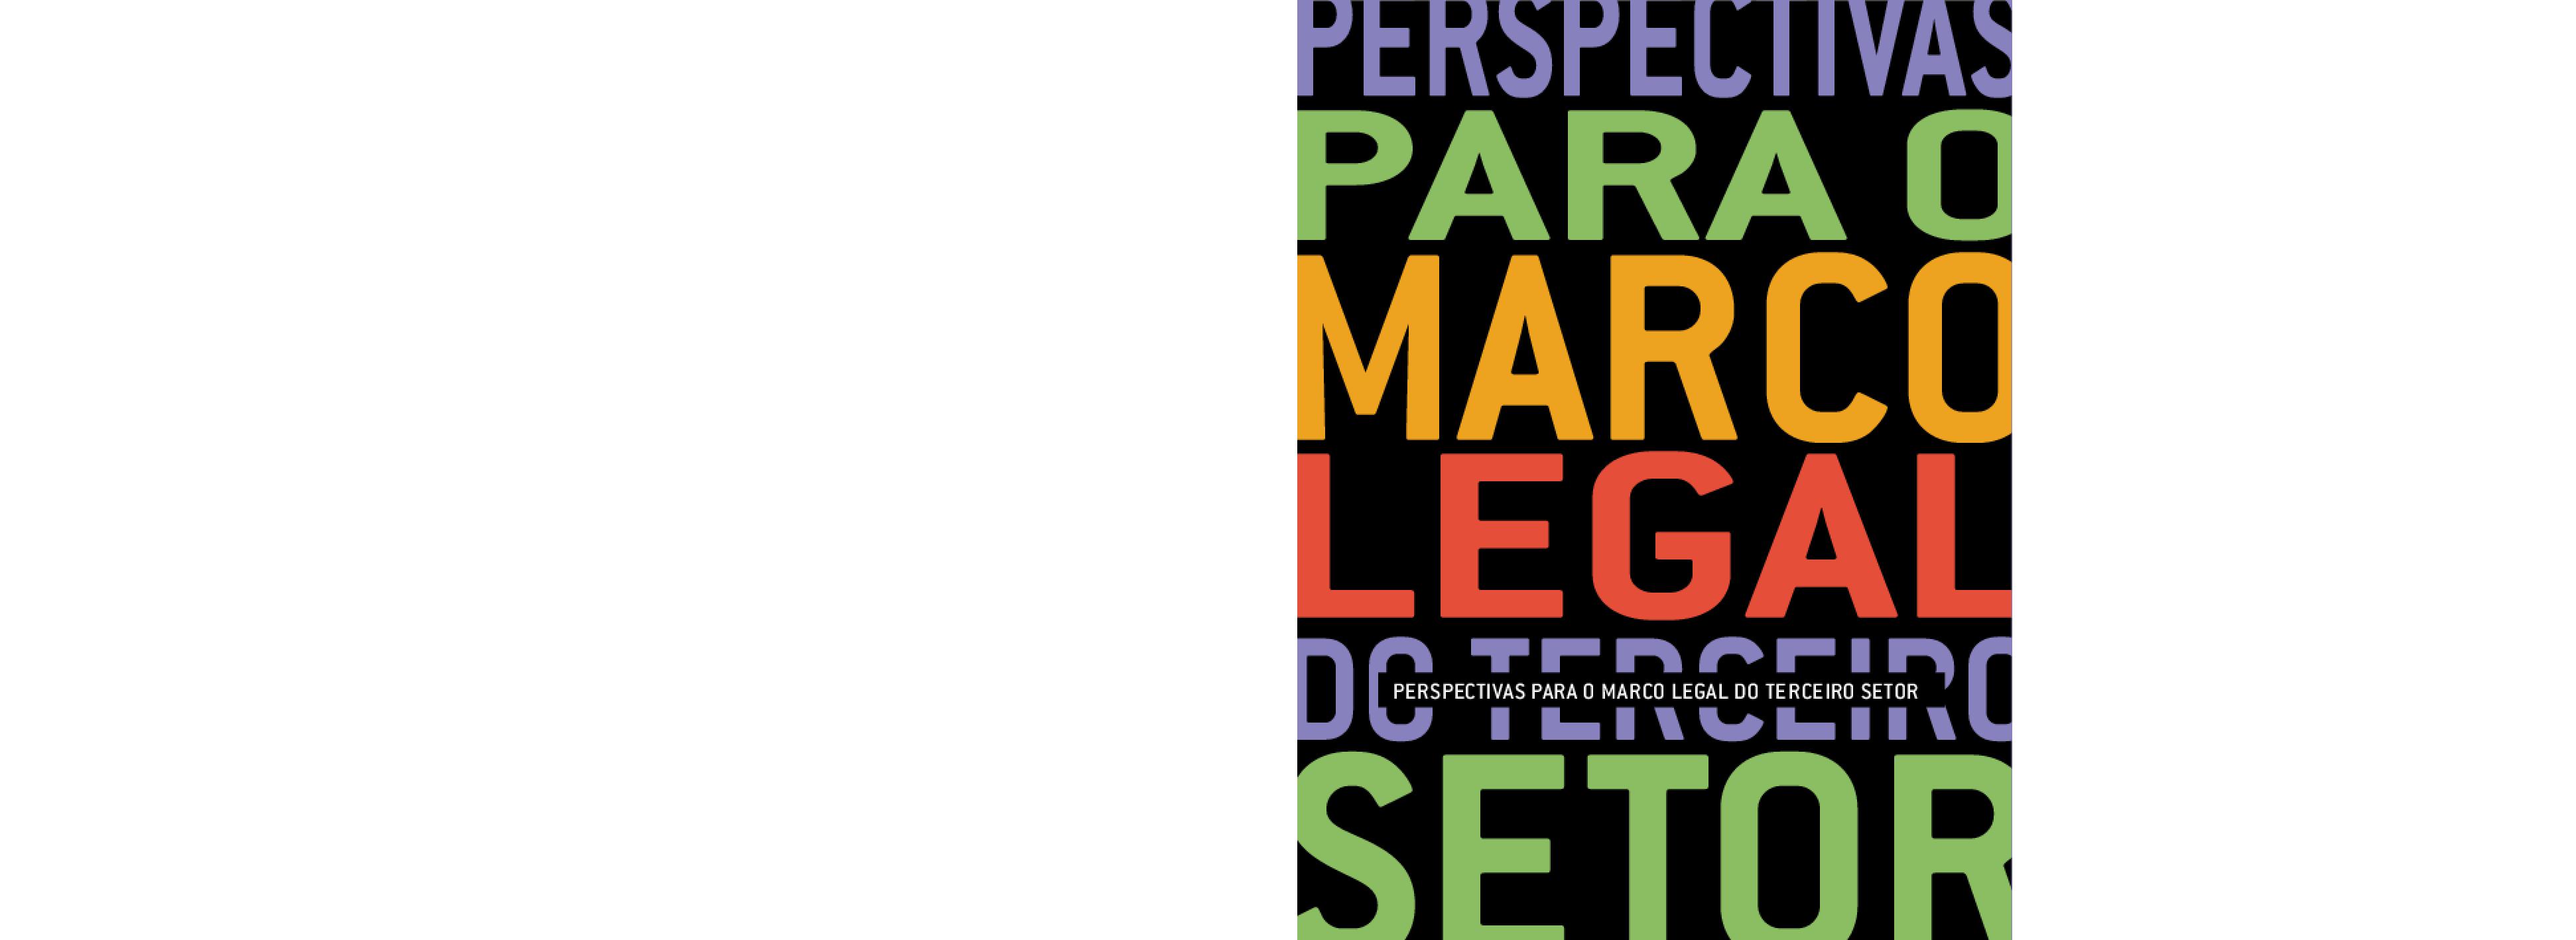 Perspectivas para o marco legal do terceiro setor